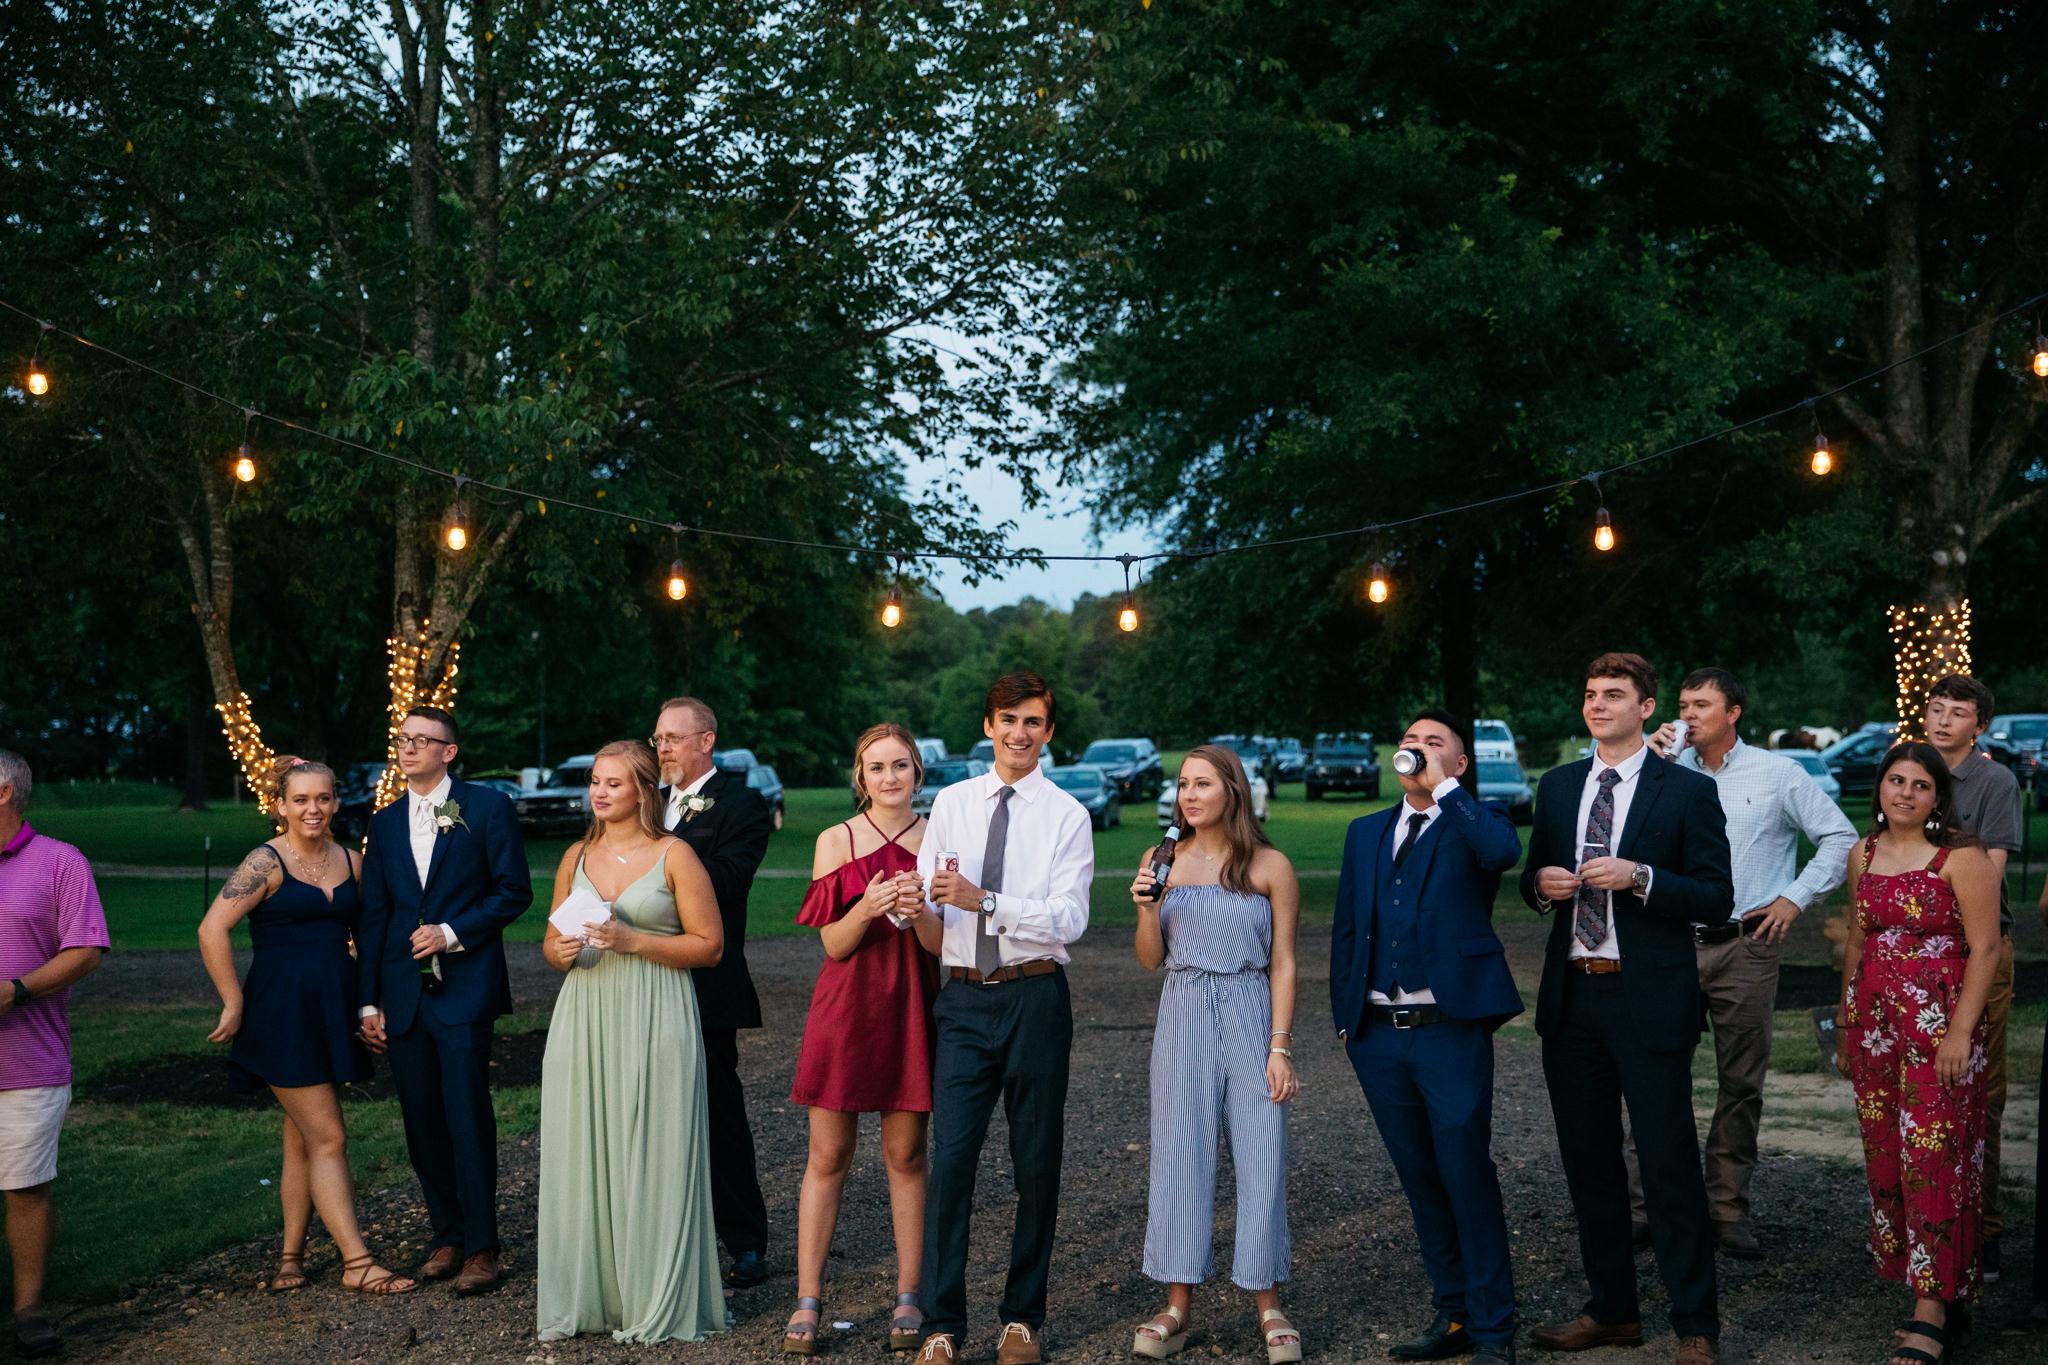 backyard-wedding-thewarmtharoundyou-lexy-branson-120.jpg